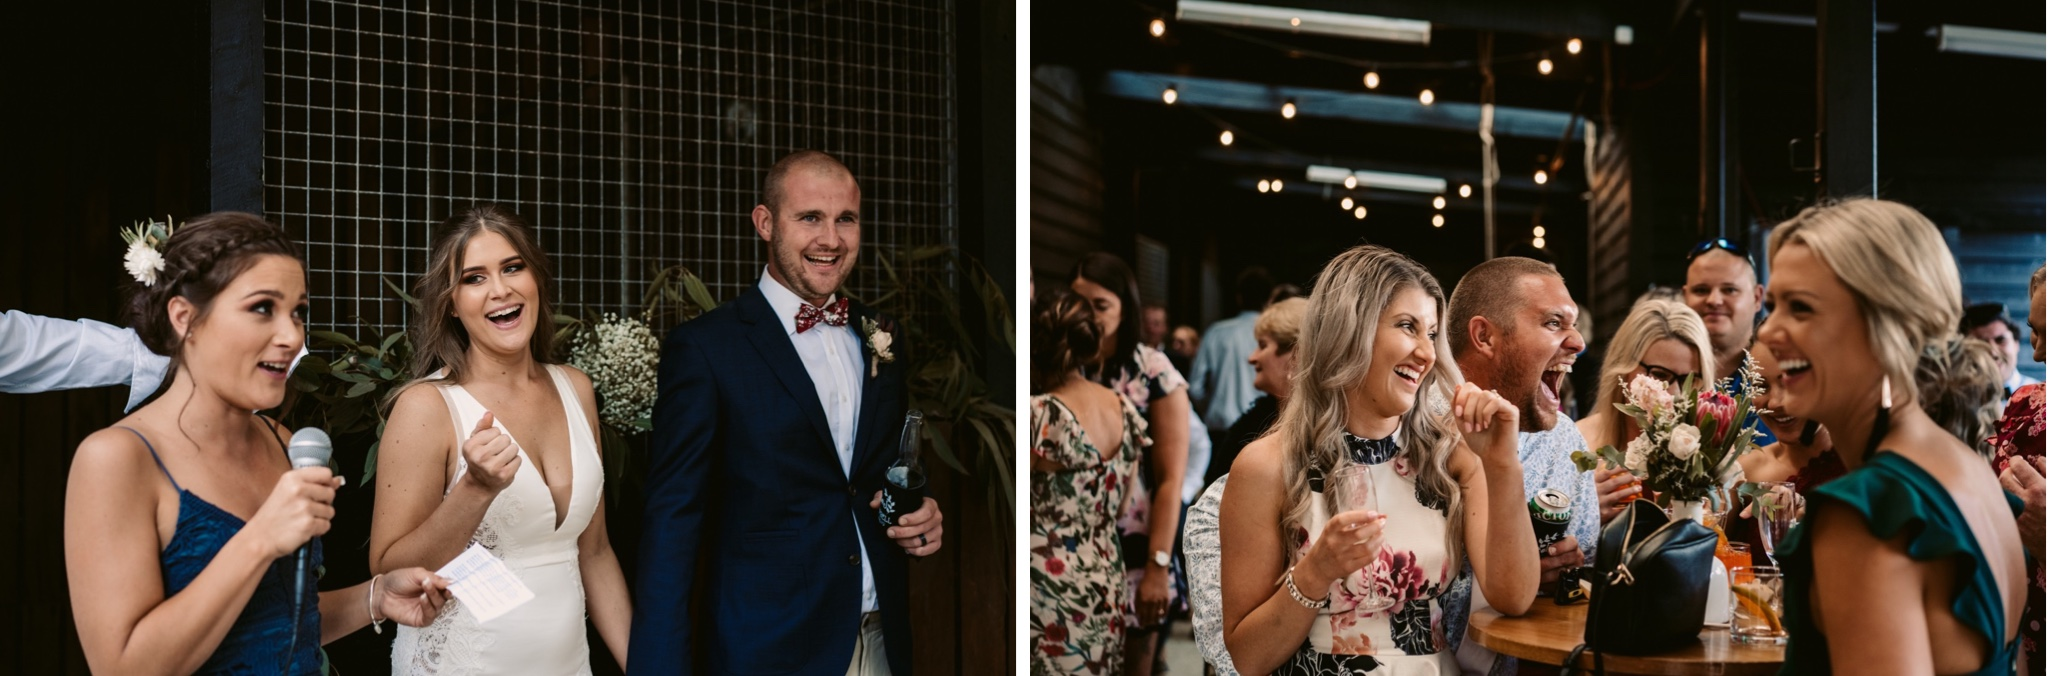 Mornington Peninsula Wedding Photography86.jpg